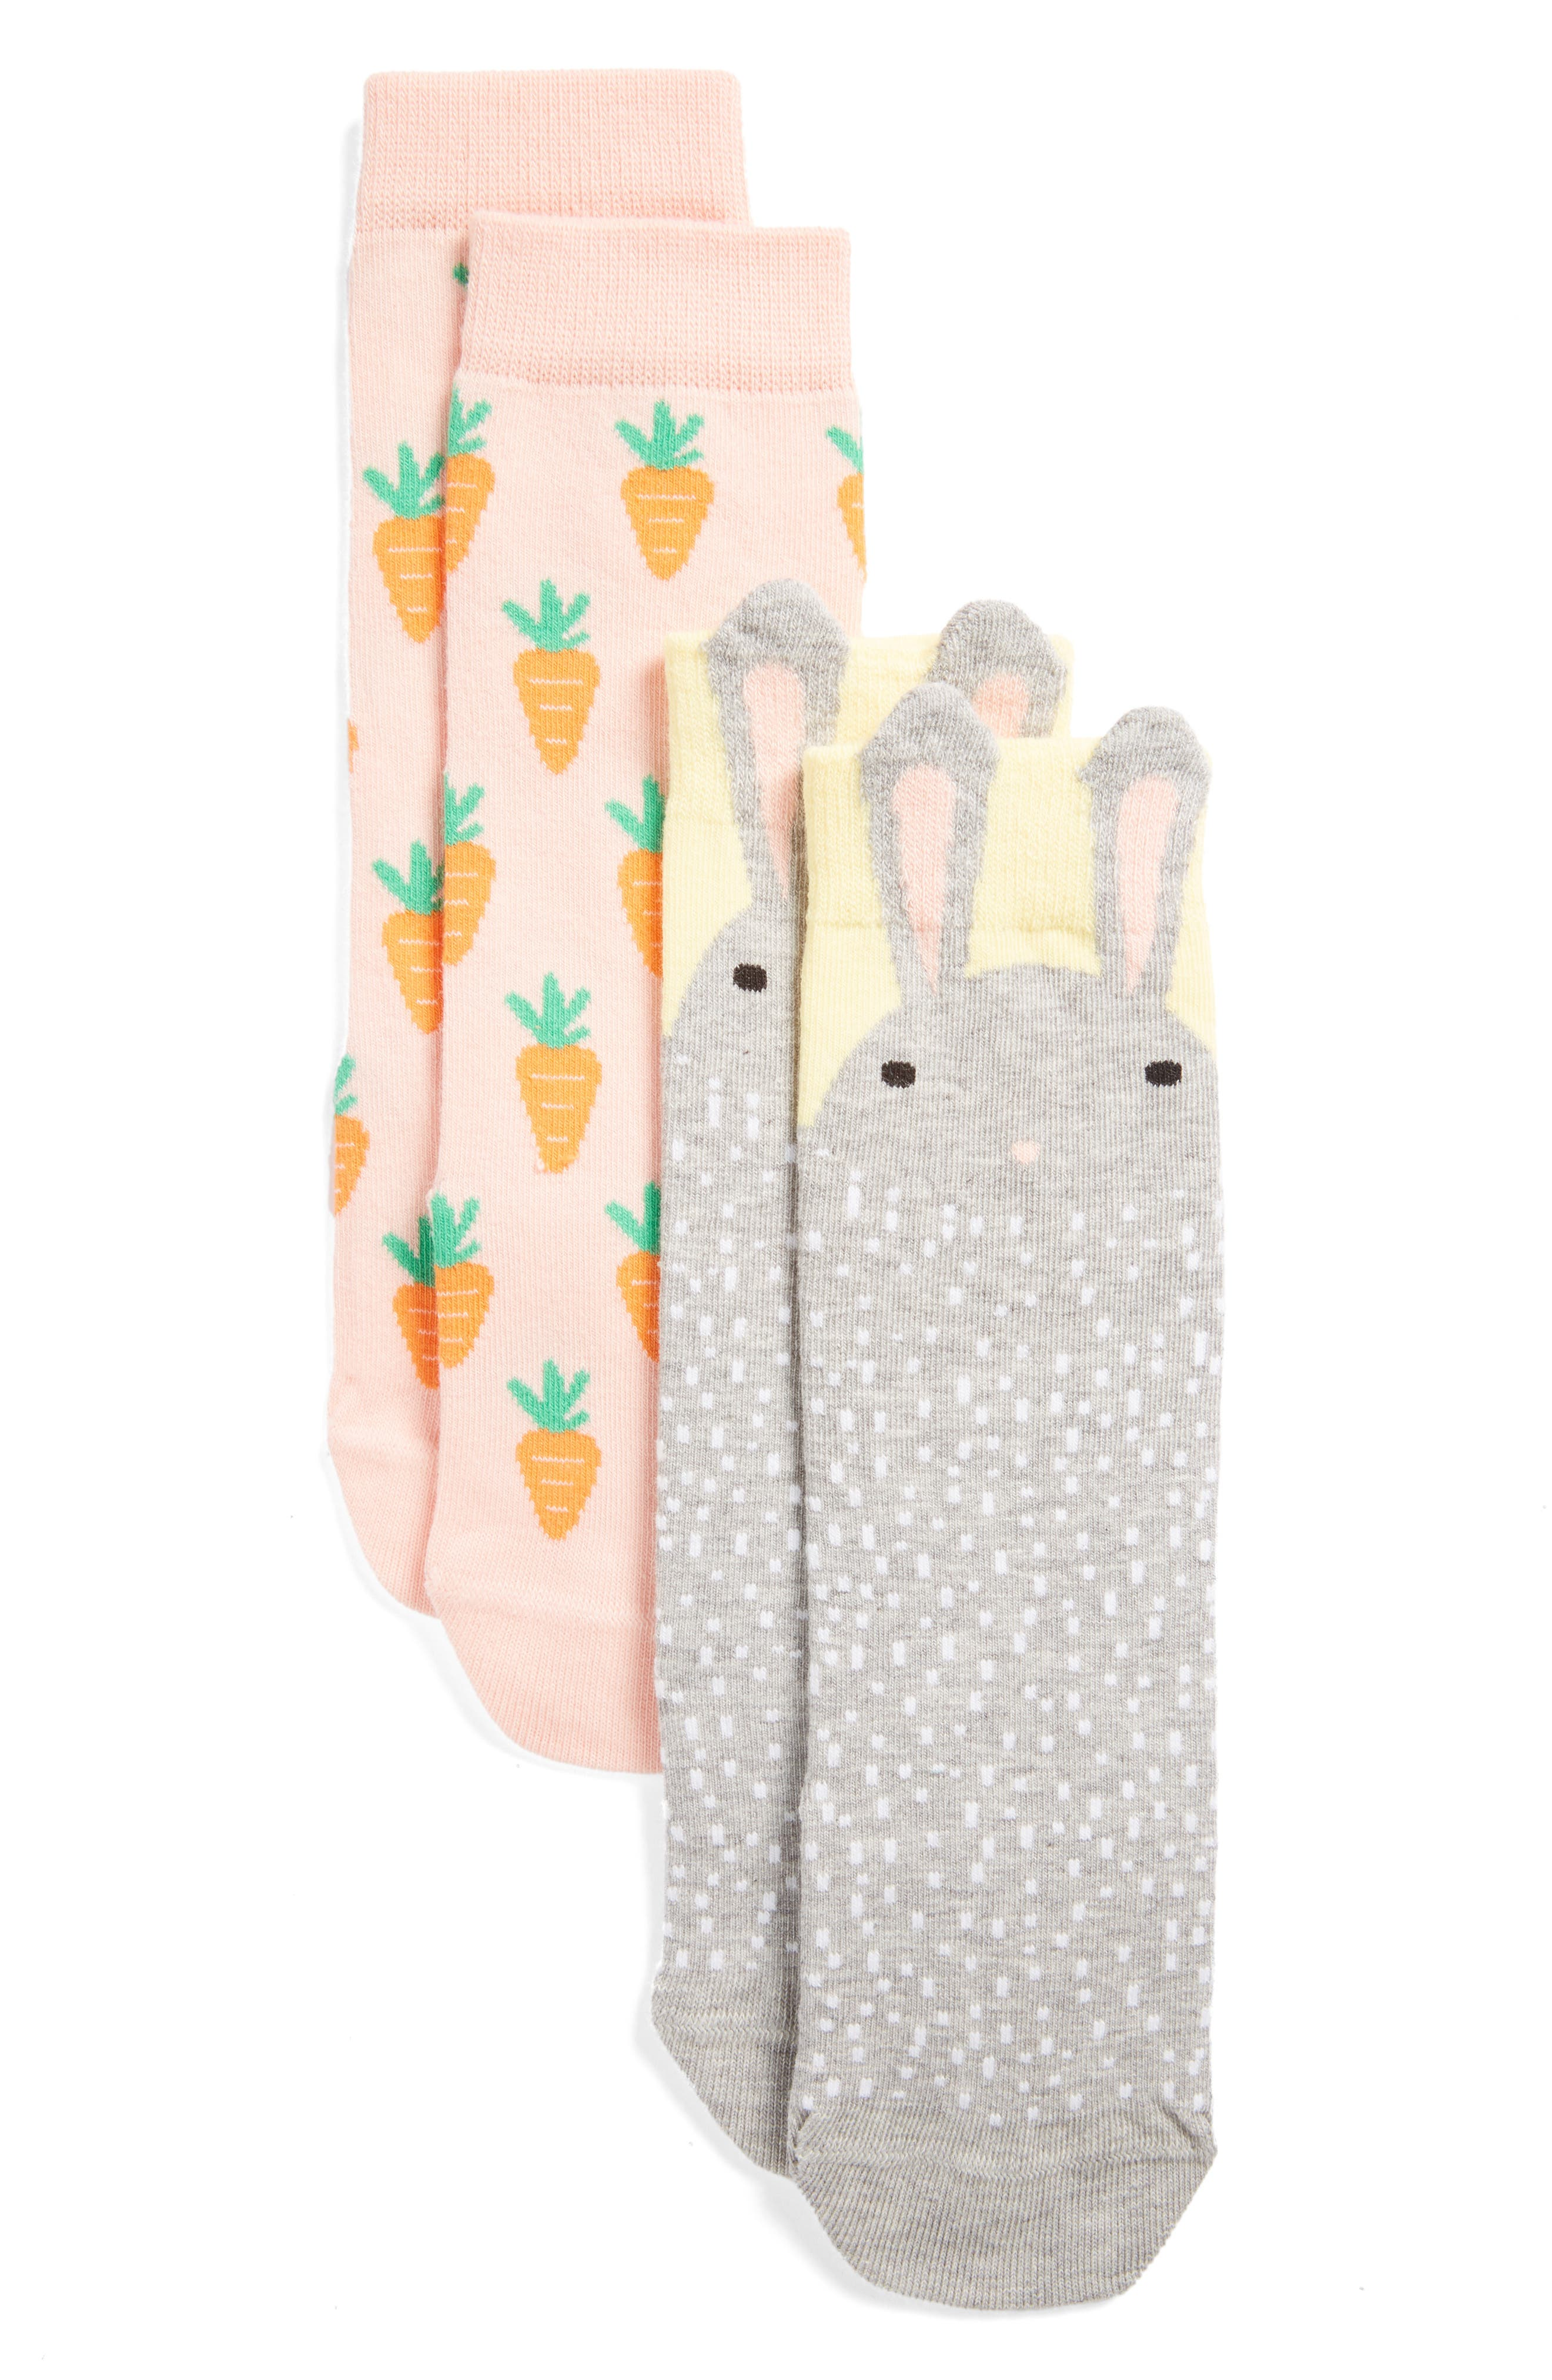 TUCKER + TATE Baby Bunny Assorted 2-Pack Socks